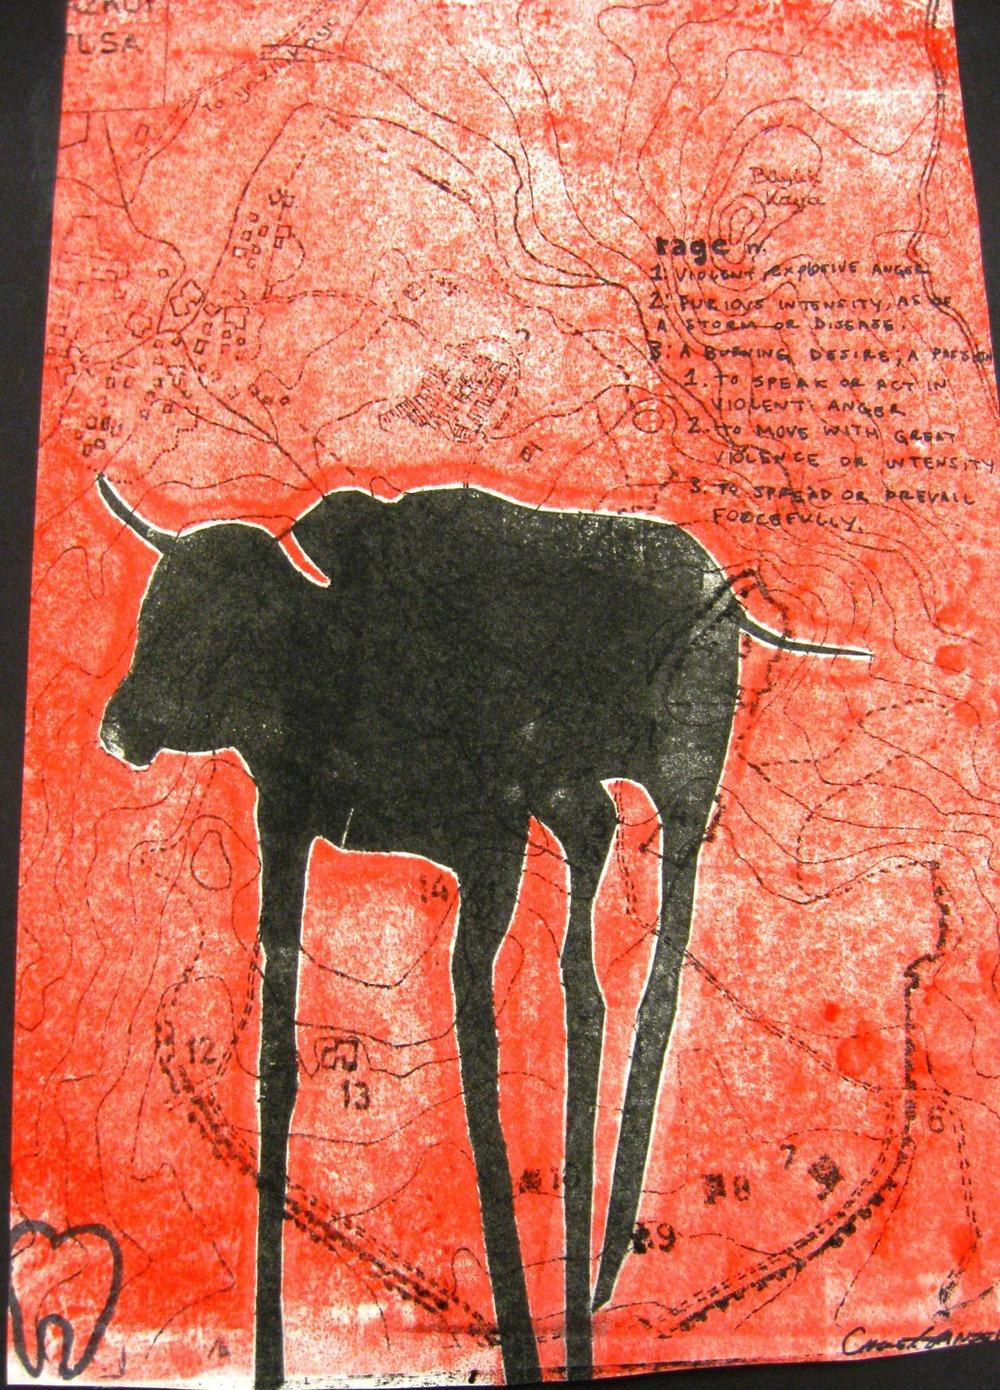 Chloe Rage - Lithography Print.JPG